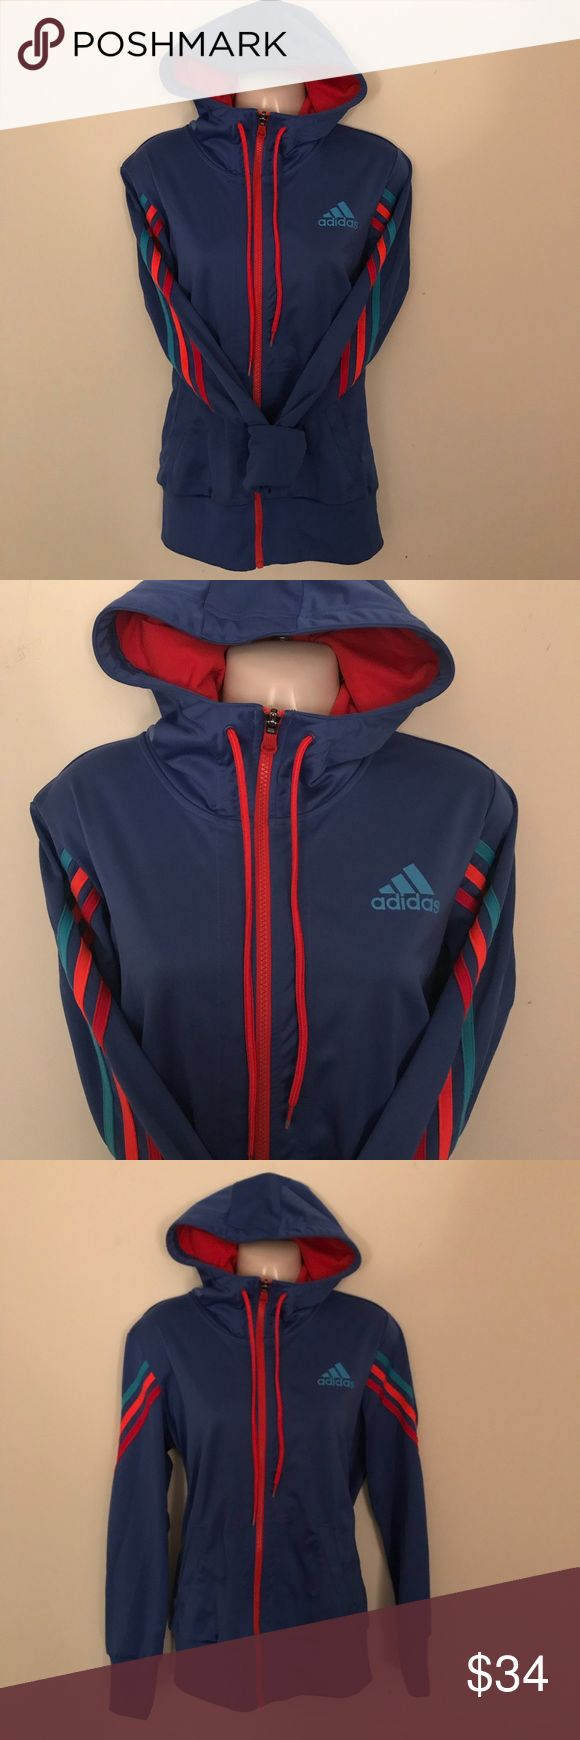 "adidas Women's Hooded Striped Zip Up Track Jacket Gently worn twice.  Size Medium Length: 27"" 100% Polyester Nonsmoking household. adidas Tops Sweatshirts & Hoodies"